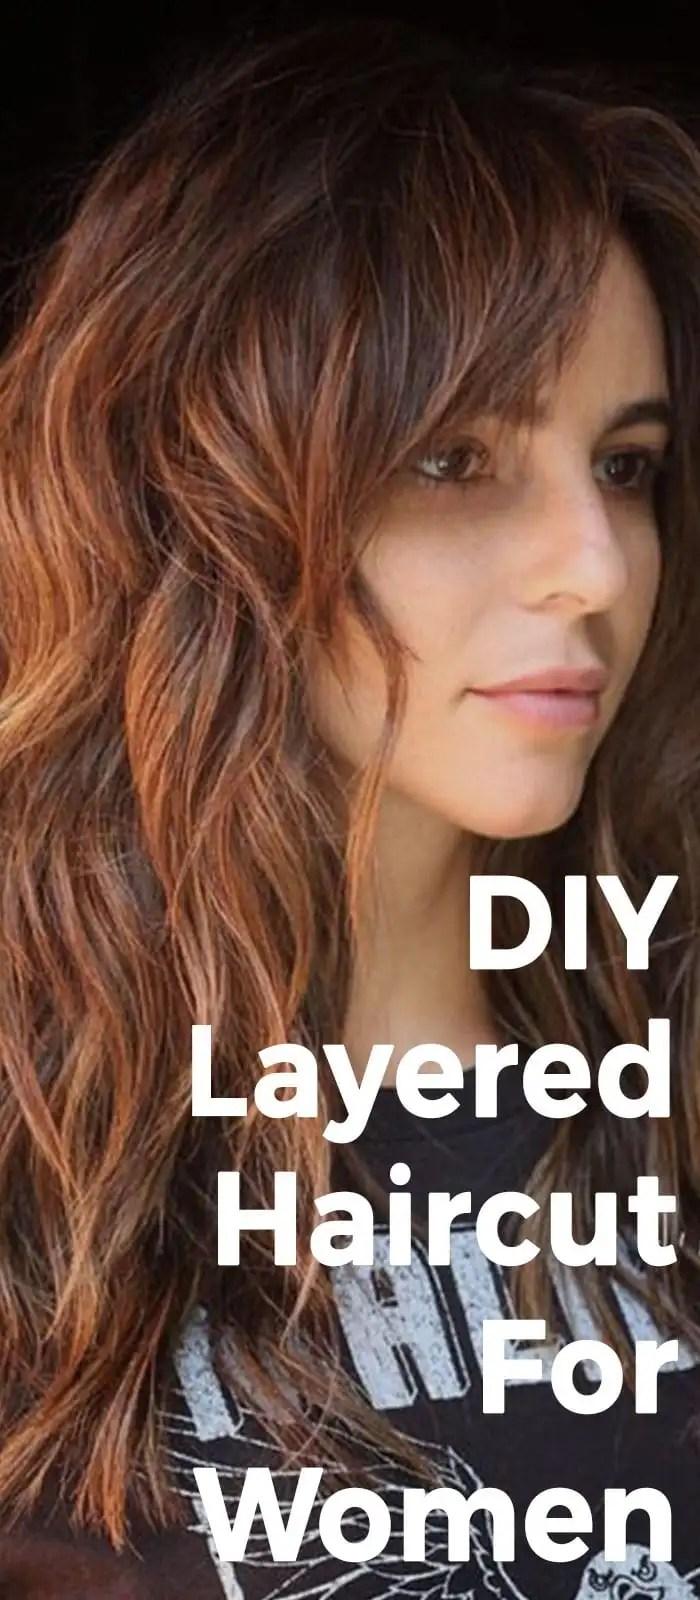 40 Diy Haircut With Layers